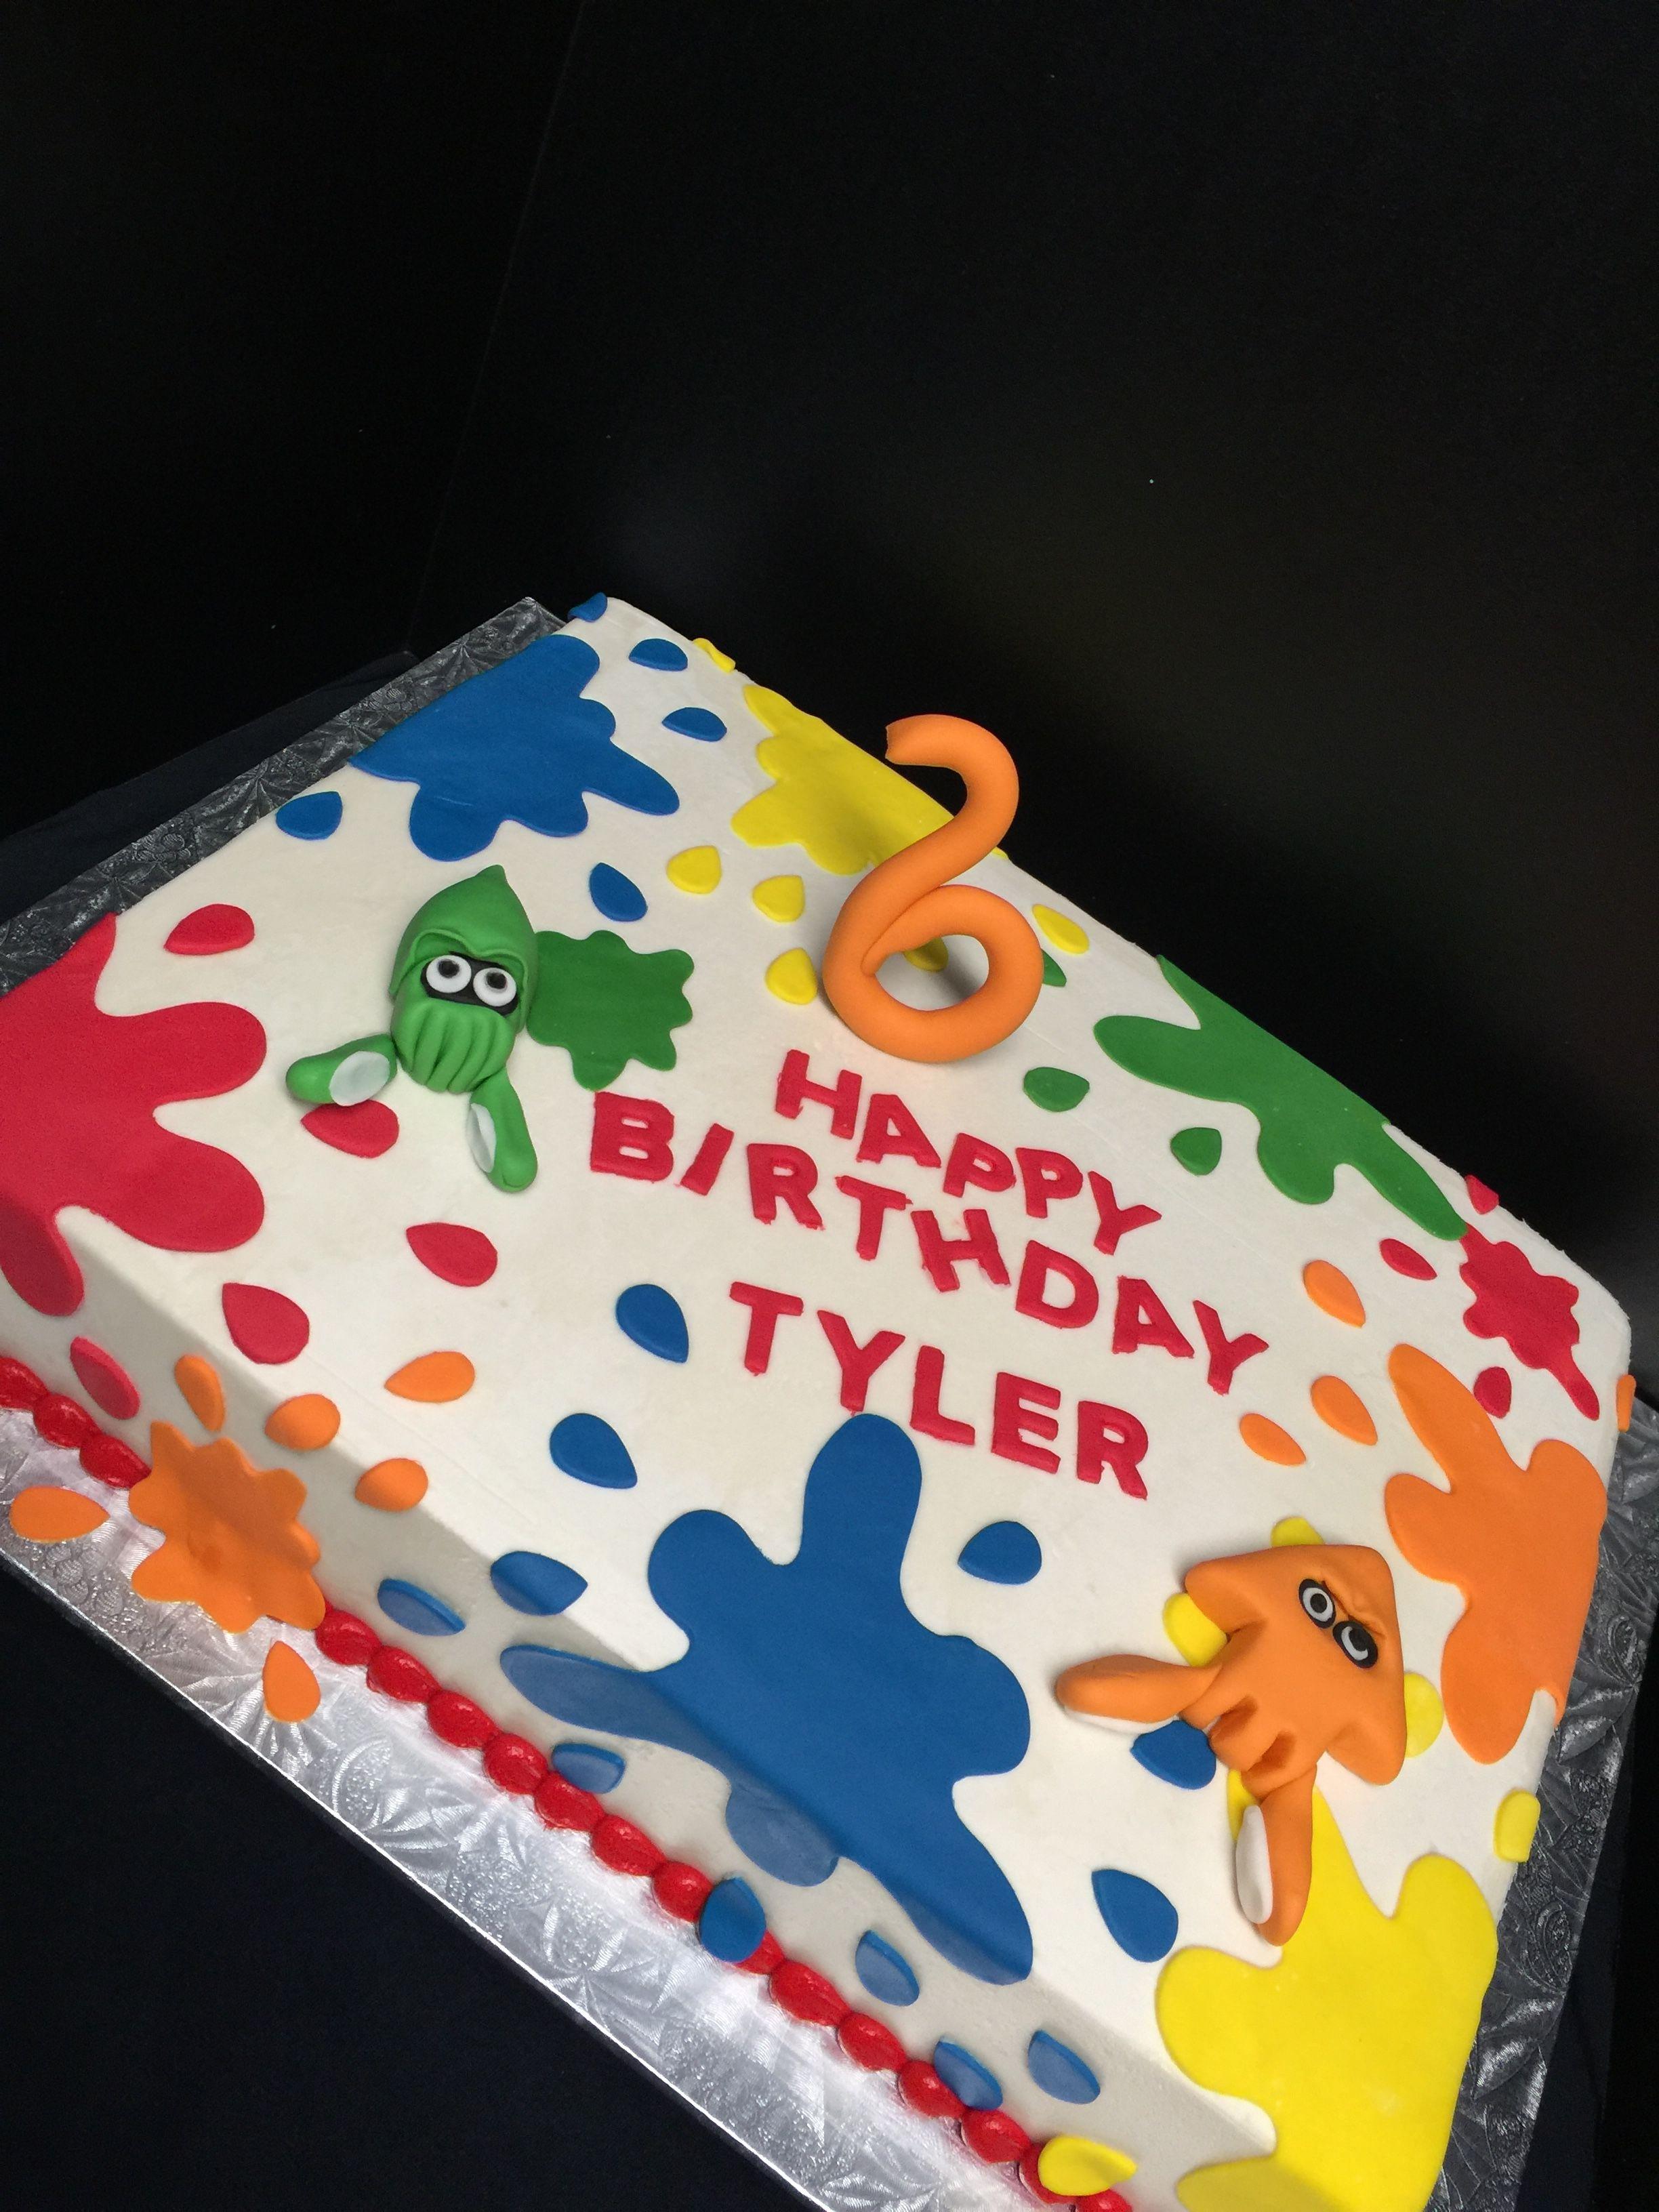 Splatoon Cake My Cakes 8th Birthday Cake 10th